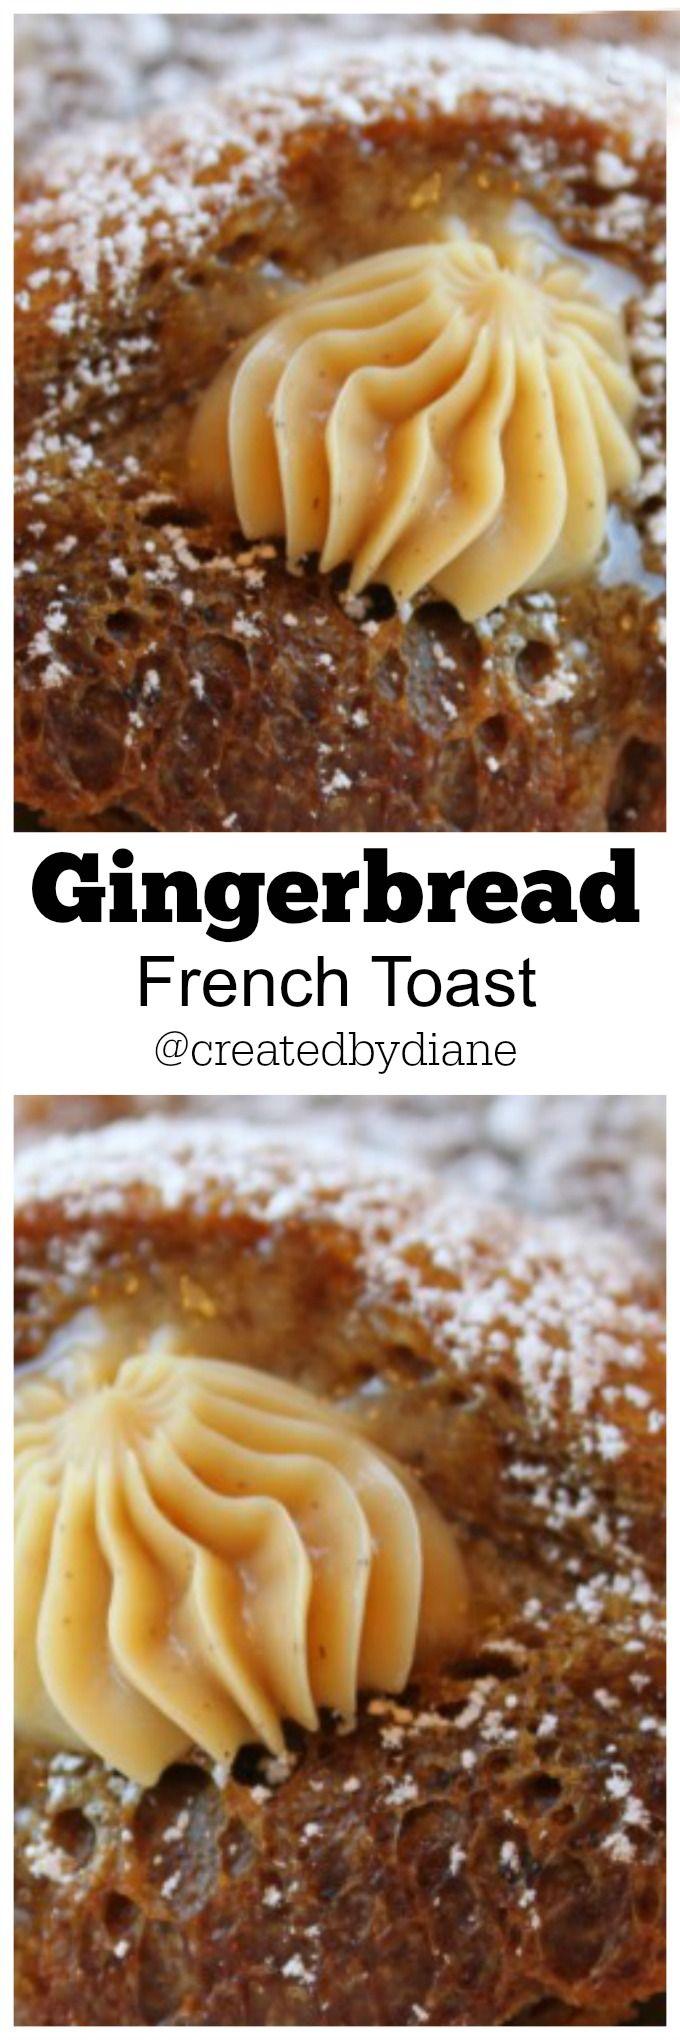 gingerbread french toast @createdbydiane